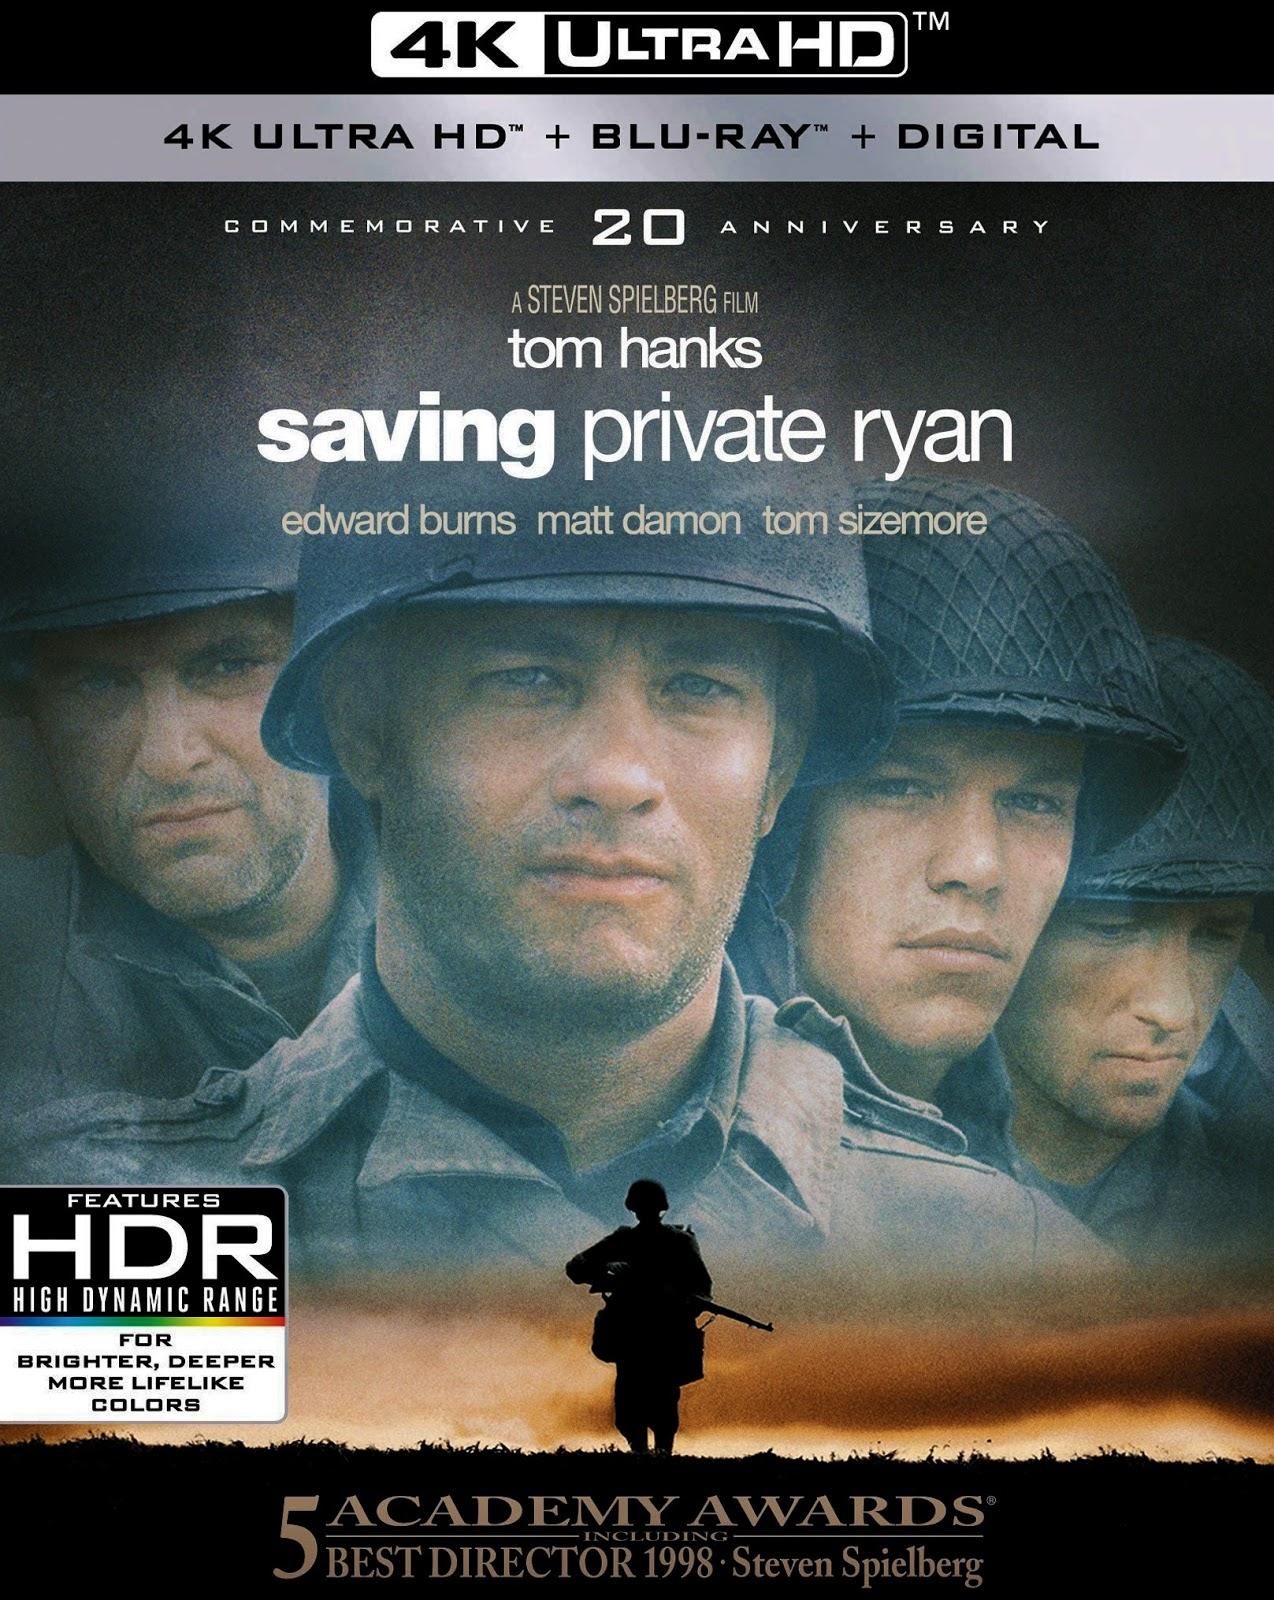 Saving Private Ryan 4k Blu Ray Dreamworks 1998 Paramount Home Video